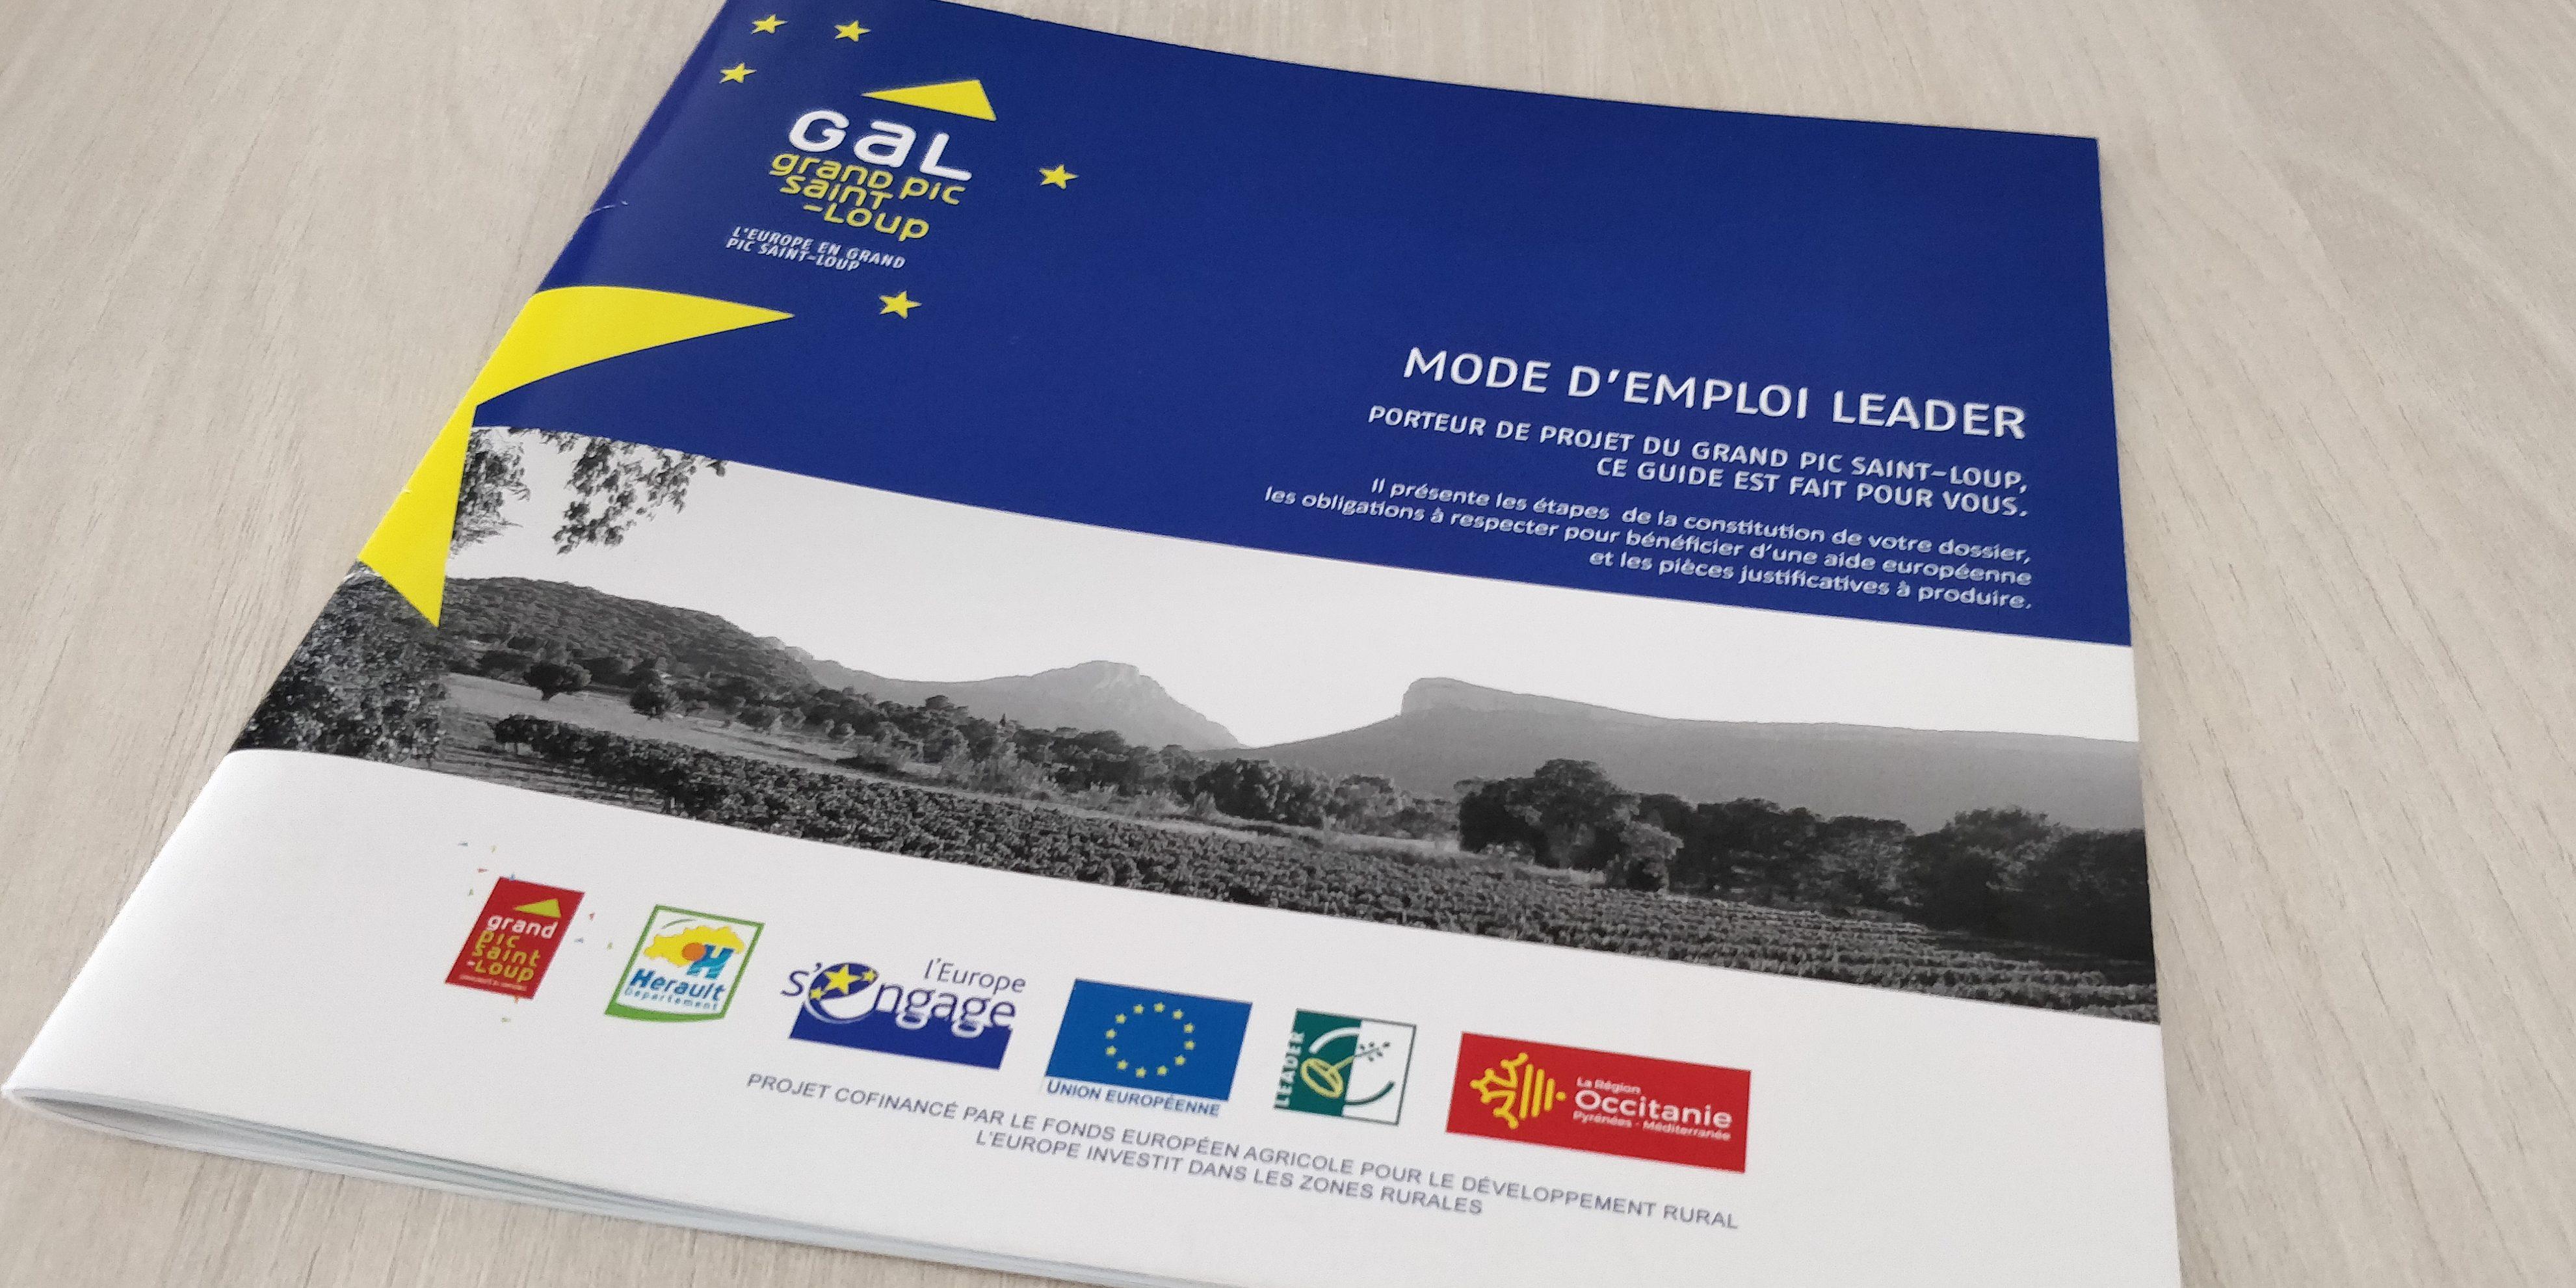 L Europe aide les entreprises du territoire. Photo : Christophe Colrat